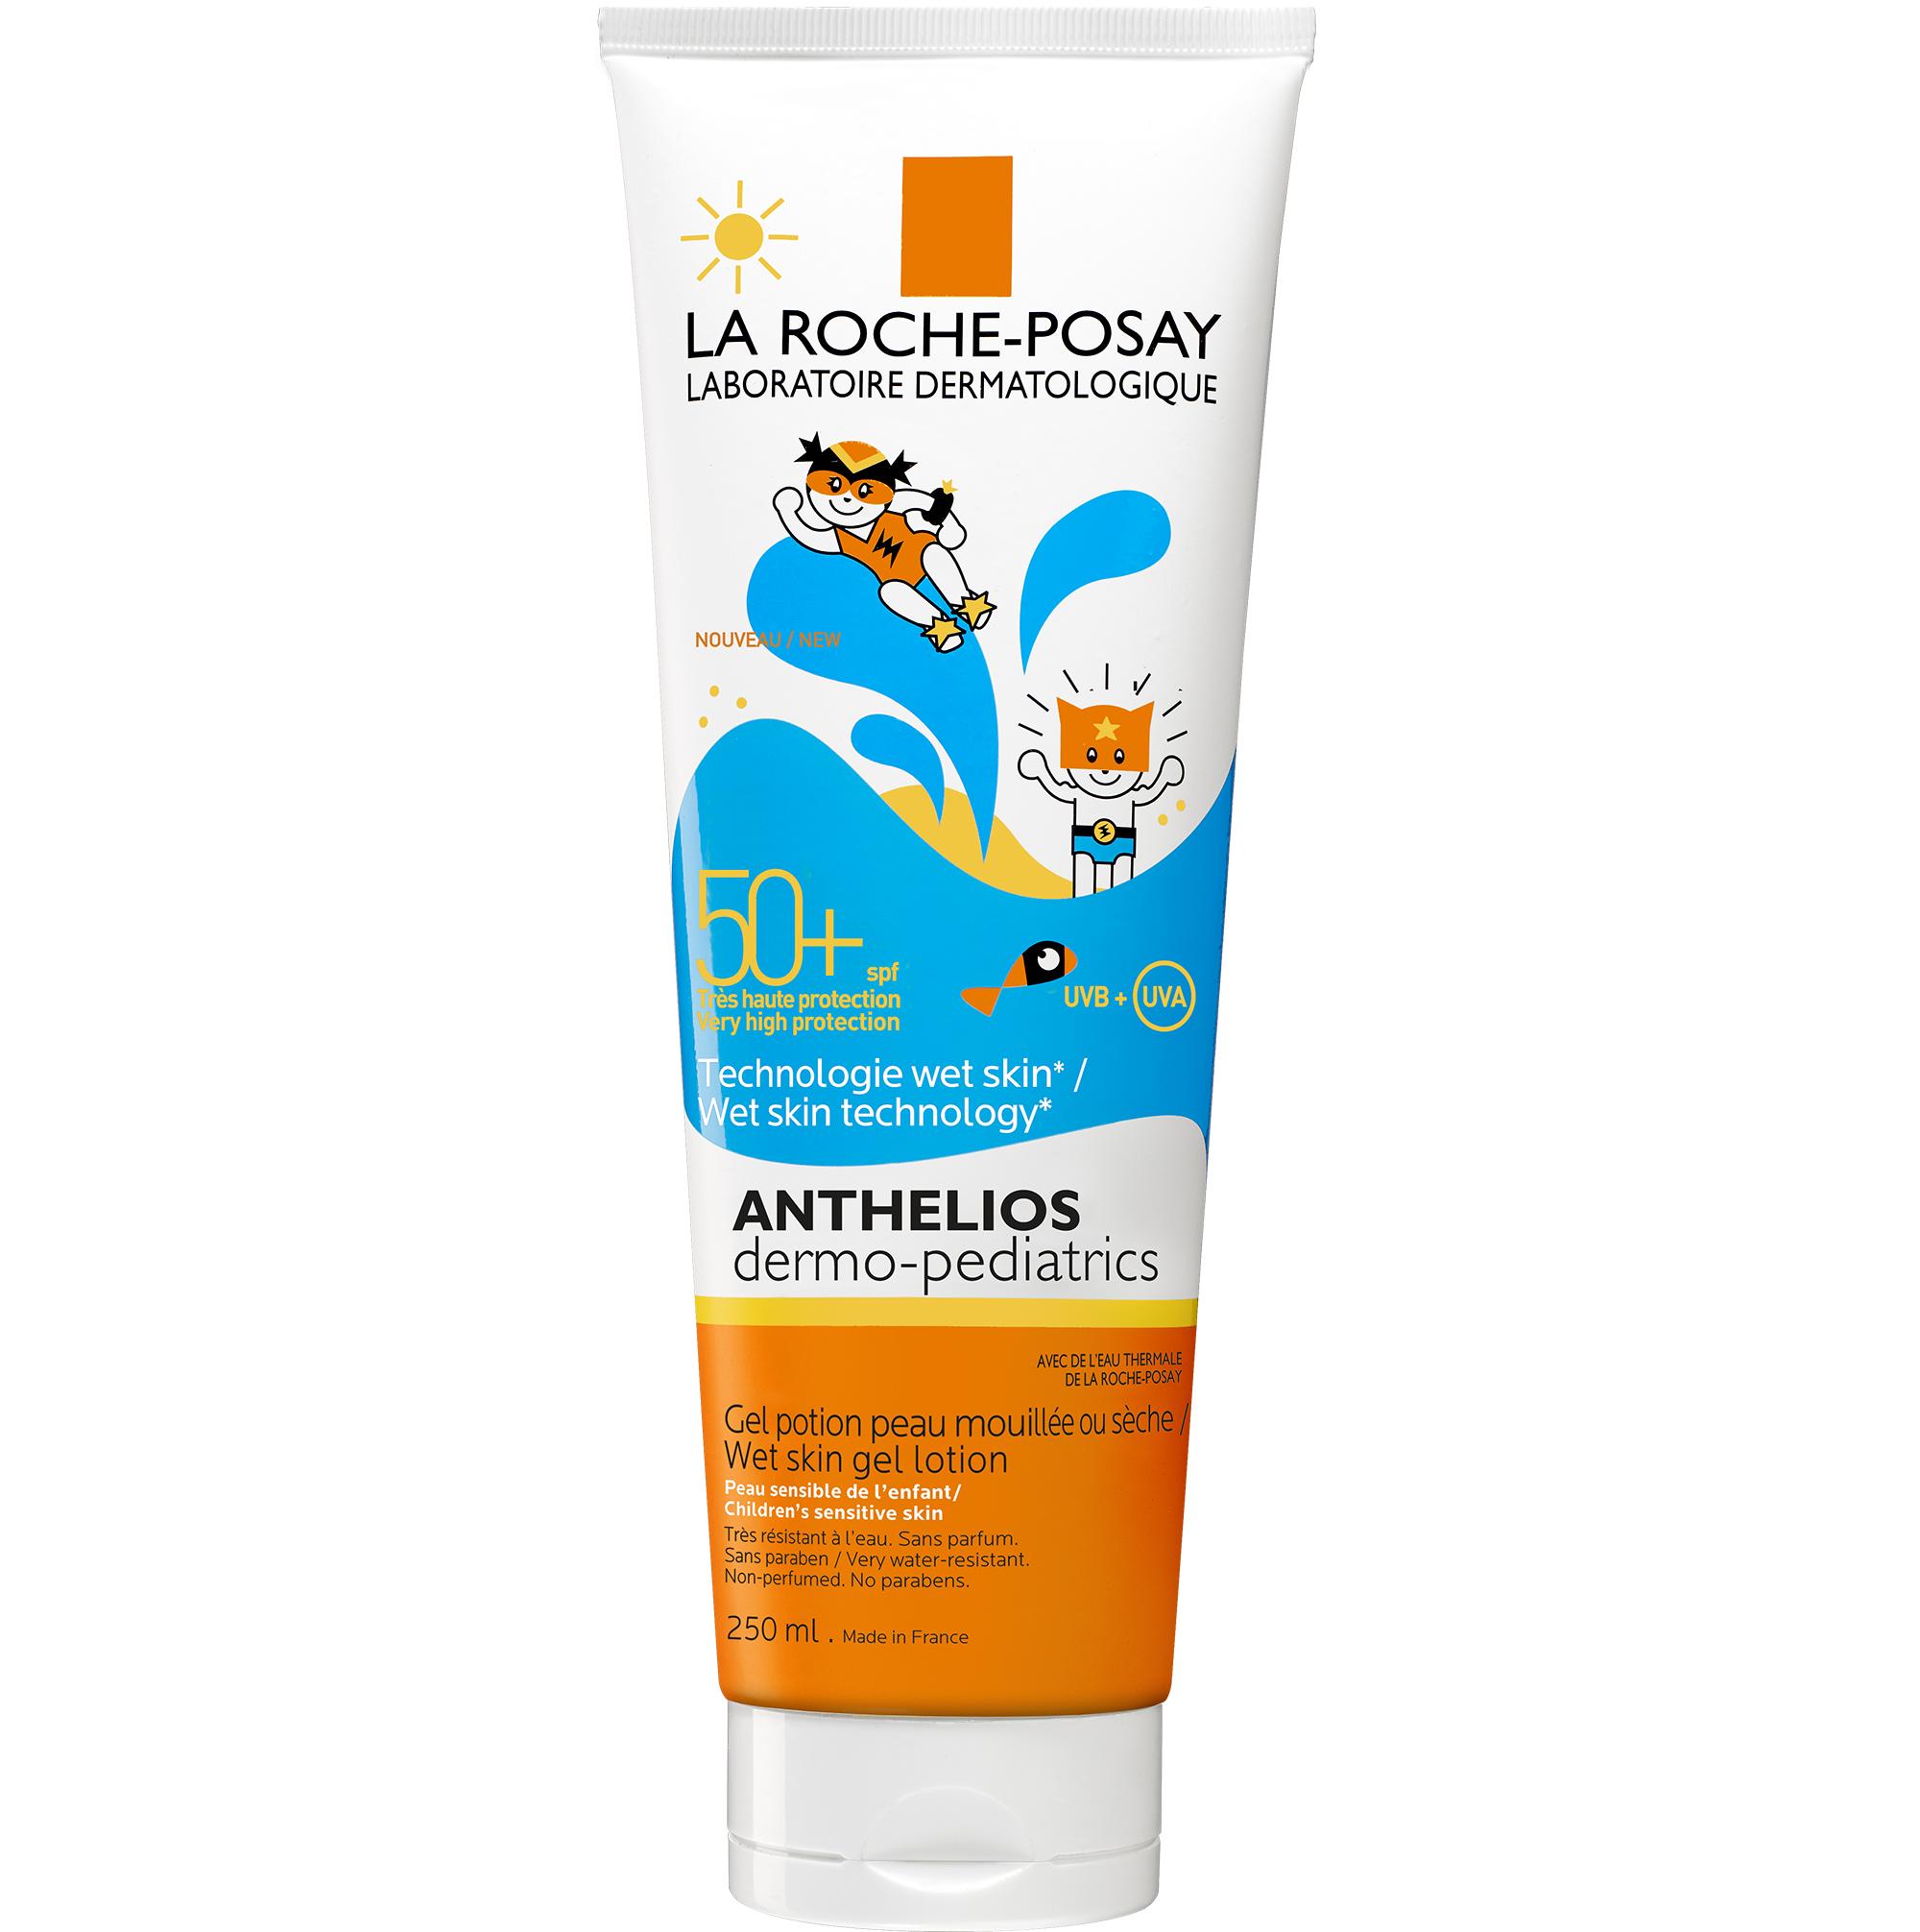 La Roche-Posay Anthelios Dermo-Pediatrics Wet Skin Gel Lotion Spf50+ ΠαιδικόΑντηλιακό Gel για Βρέγμένο ή Στεγνό Δέρμα250ml